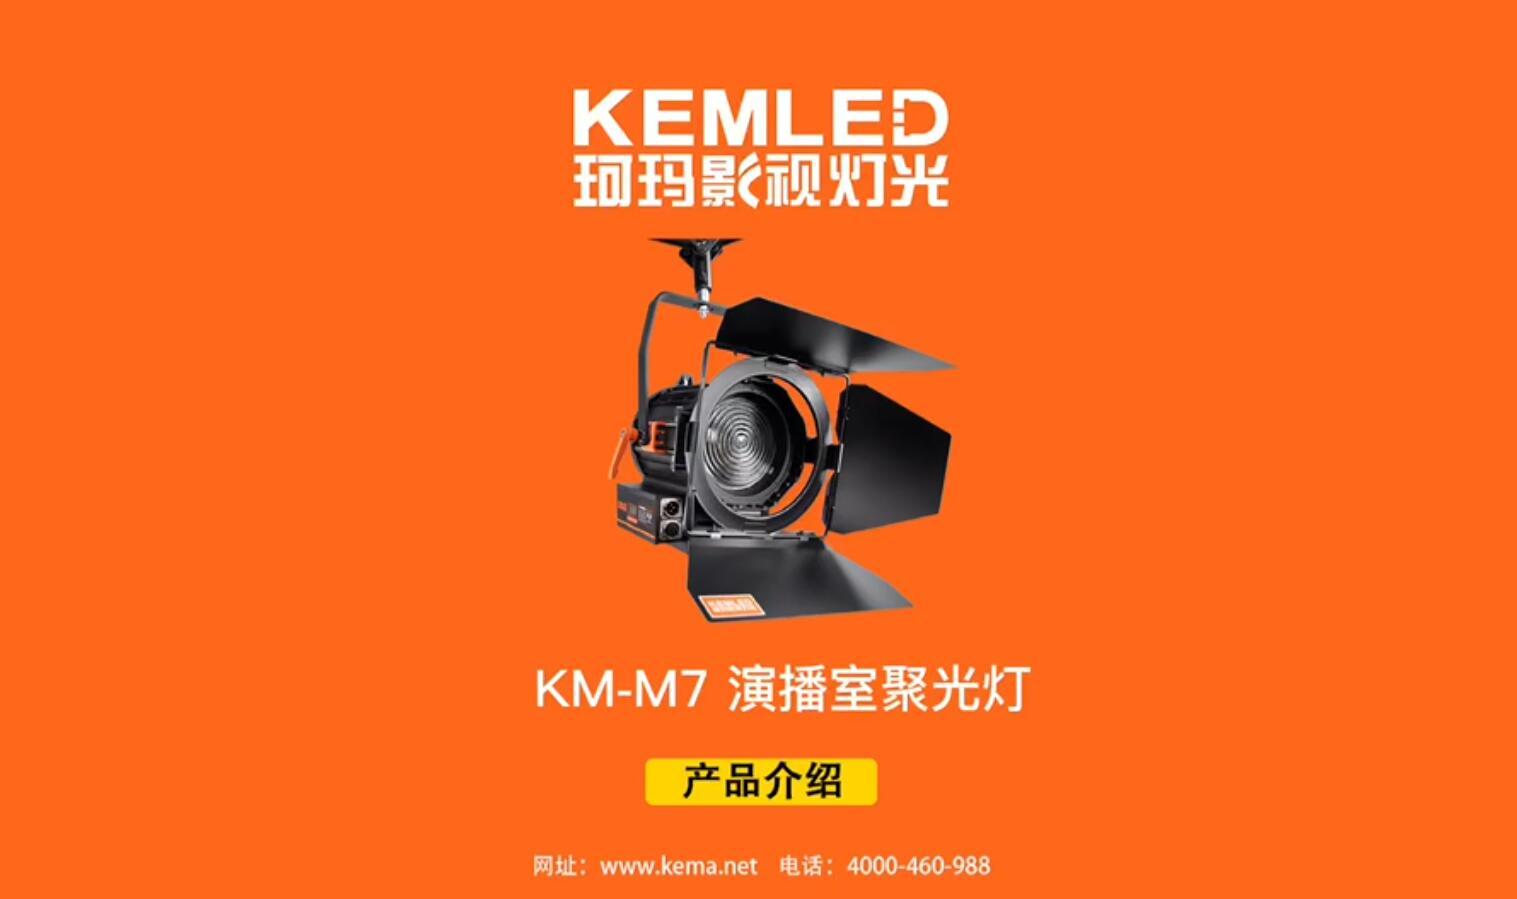 KM-M7 70W演播室LED聚光灯